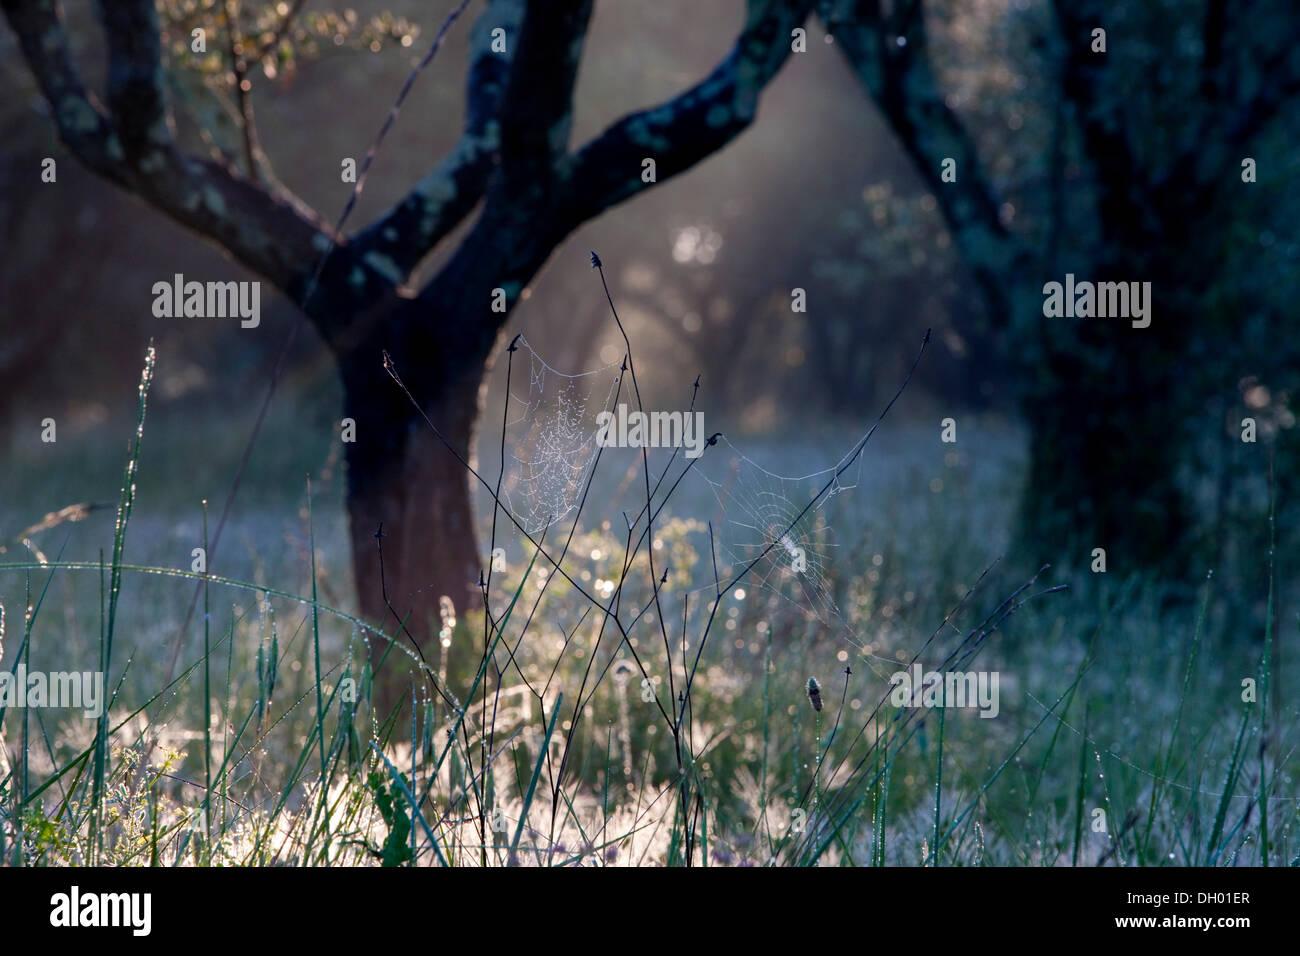 Olive tree (Olea europaea), backlit, Alpes-de-Haute-Provence, France - Stock Image